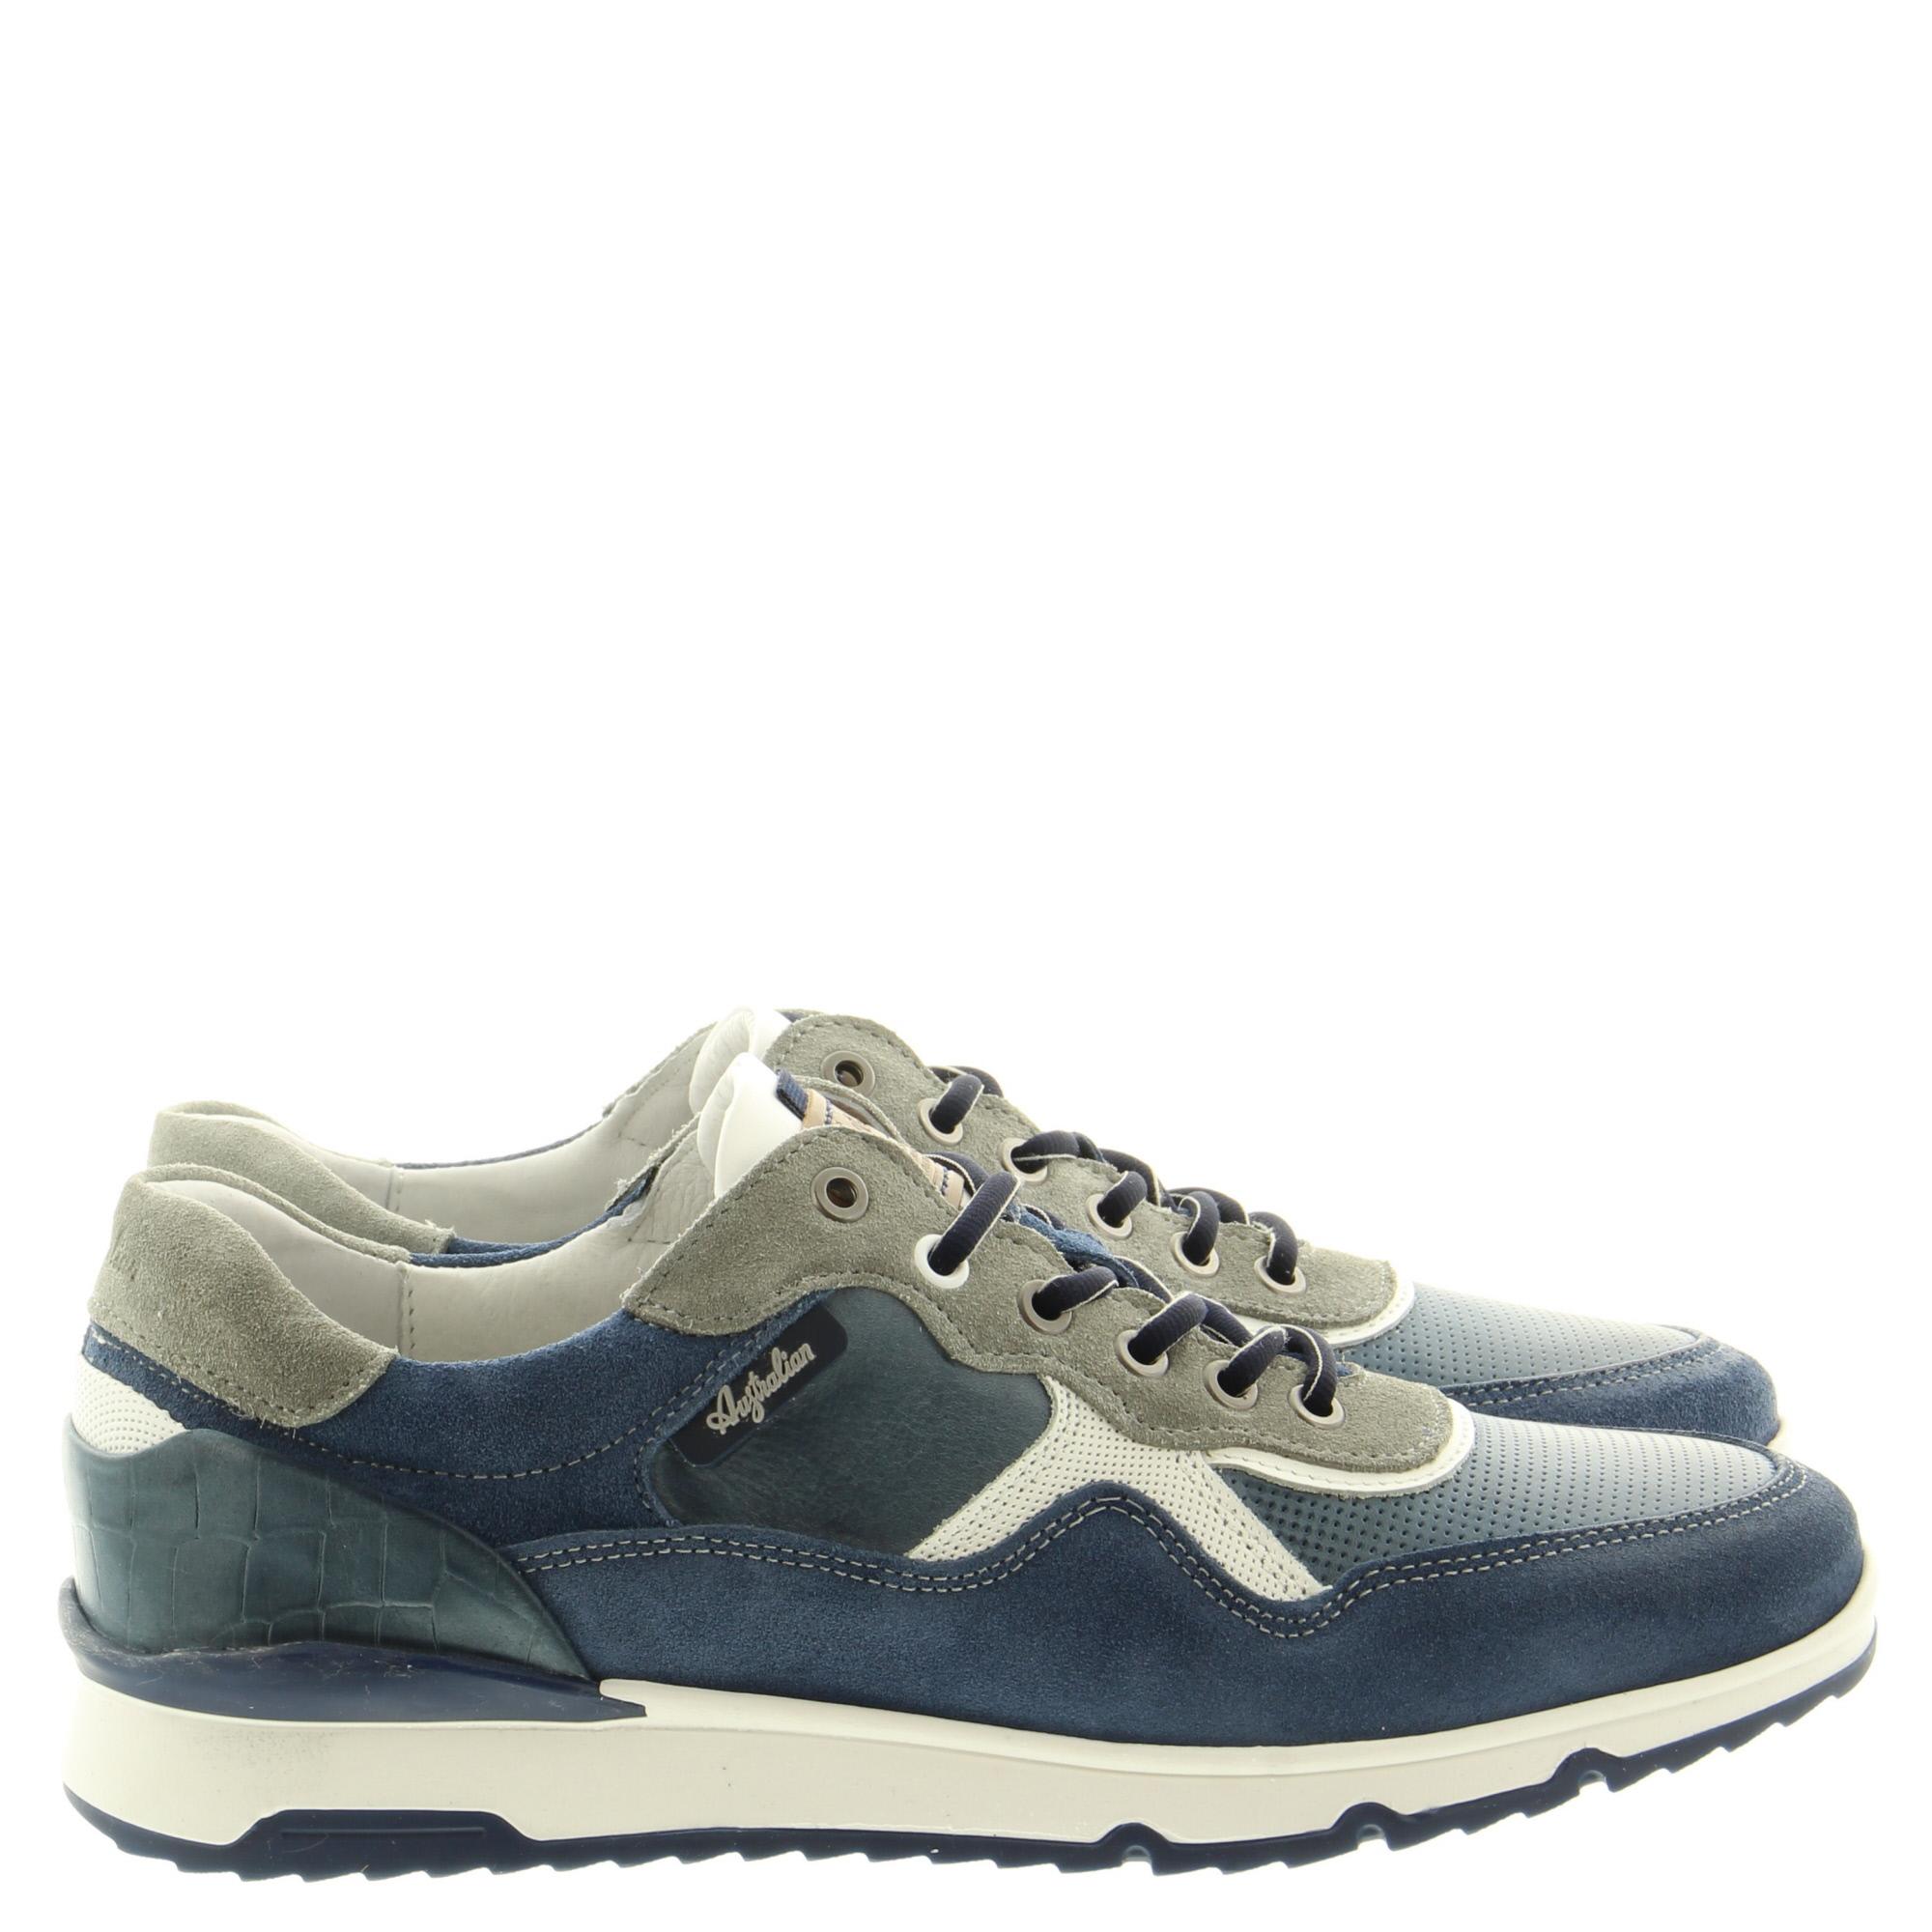 Australian Footwear Mazoni 15.1519.01 SI7 Blue grey white